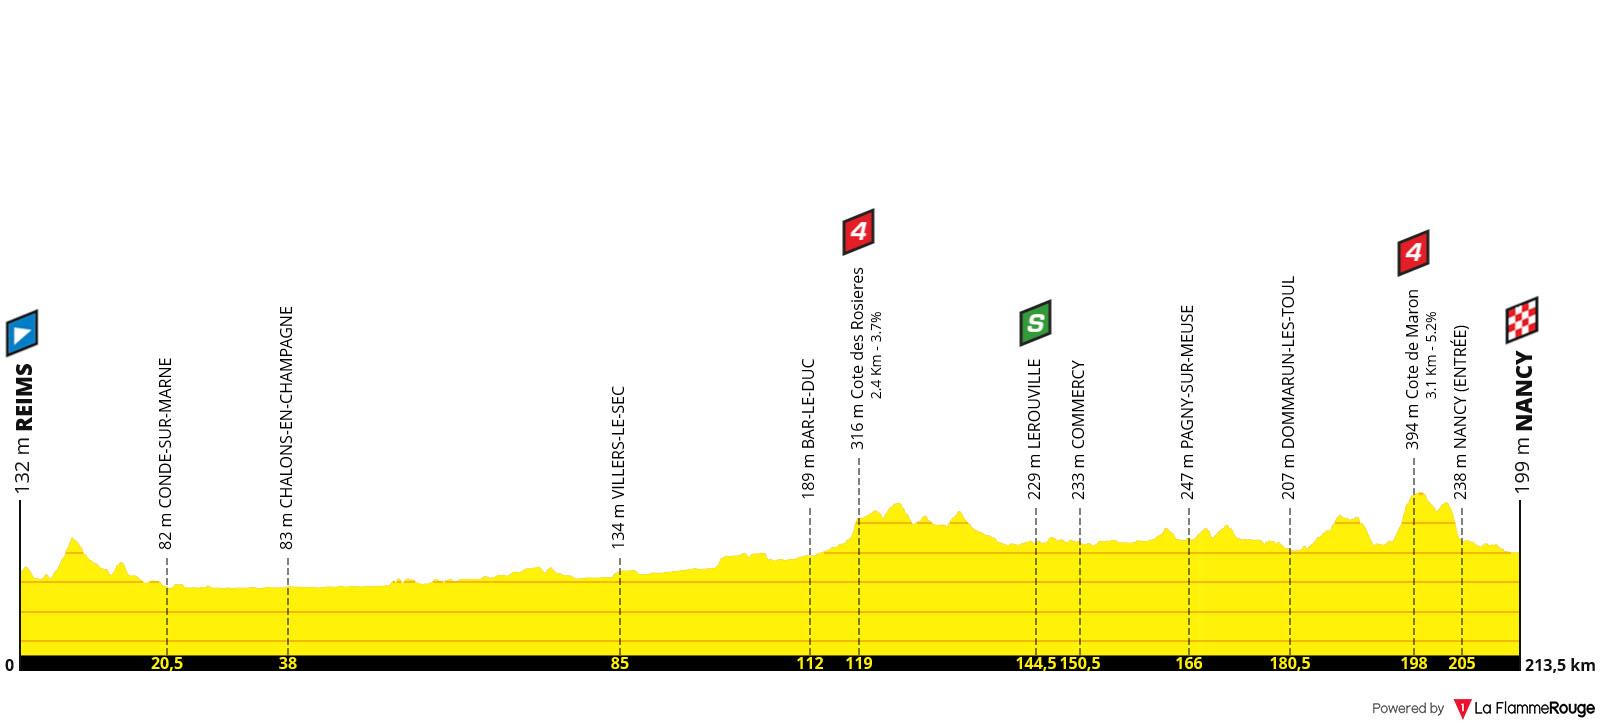 Perfil Etapa 04 - Tour de Francia 2019